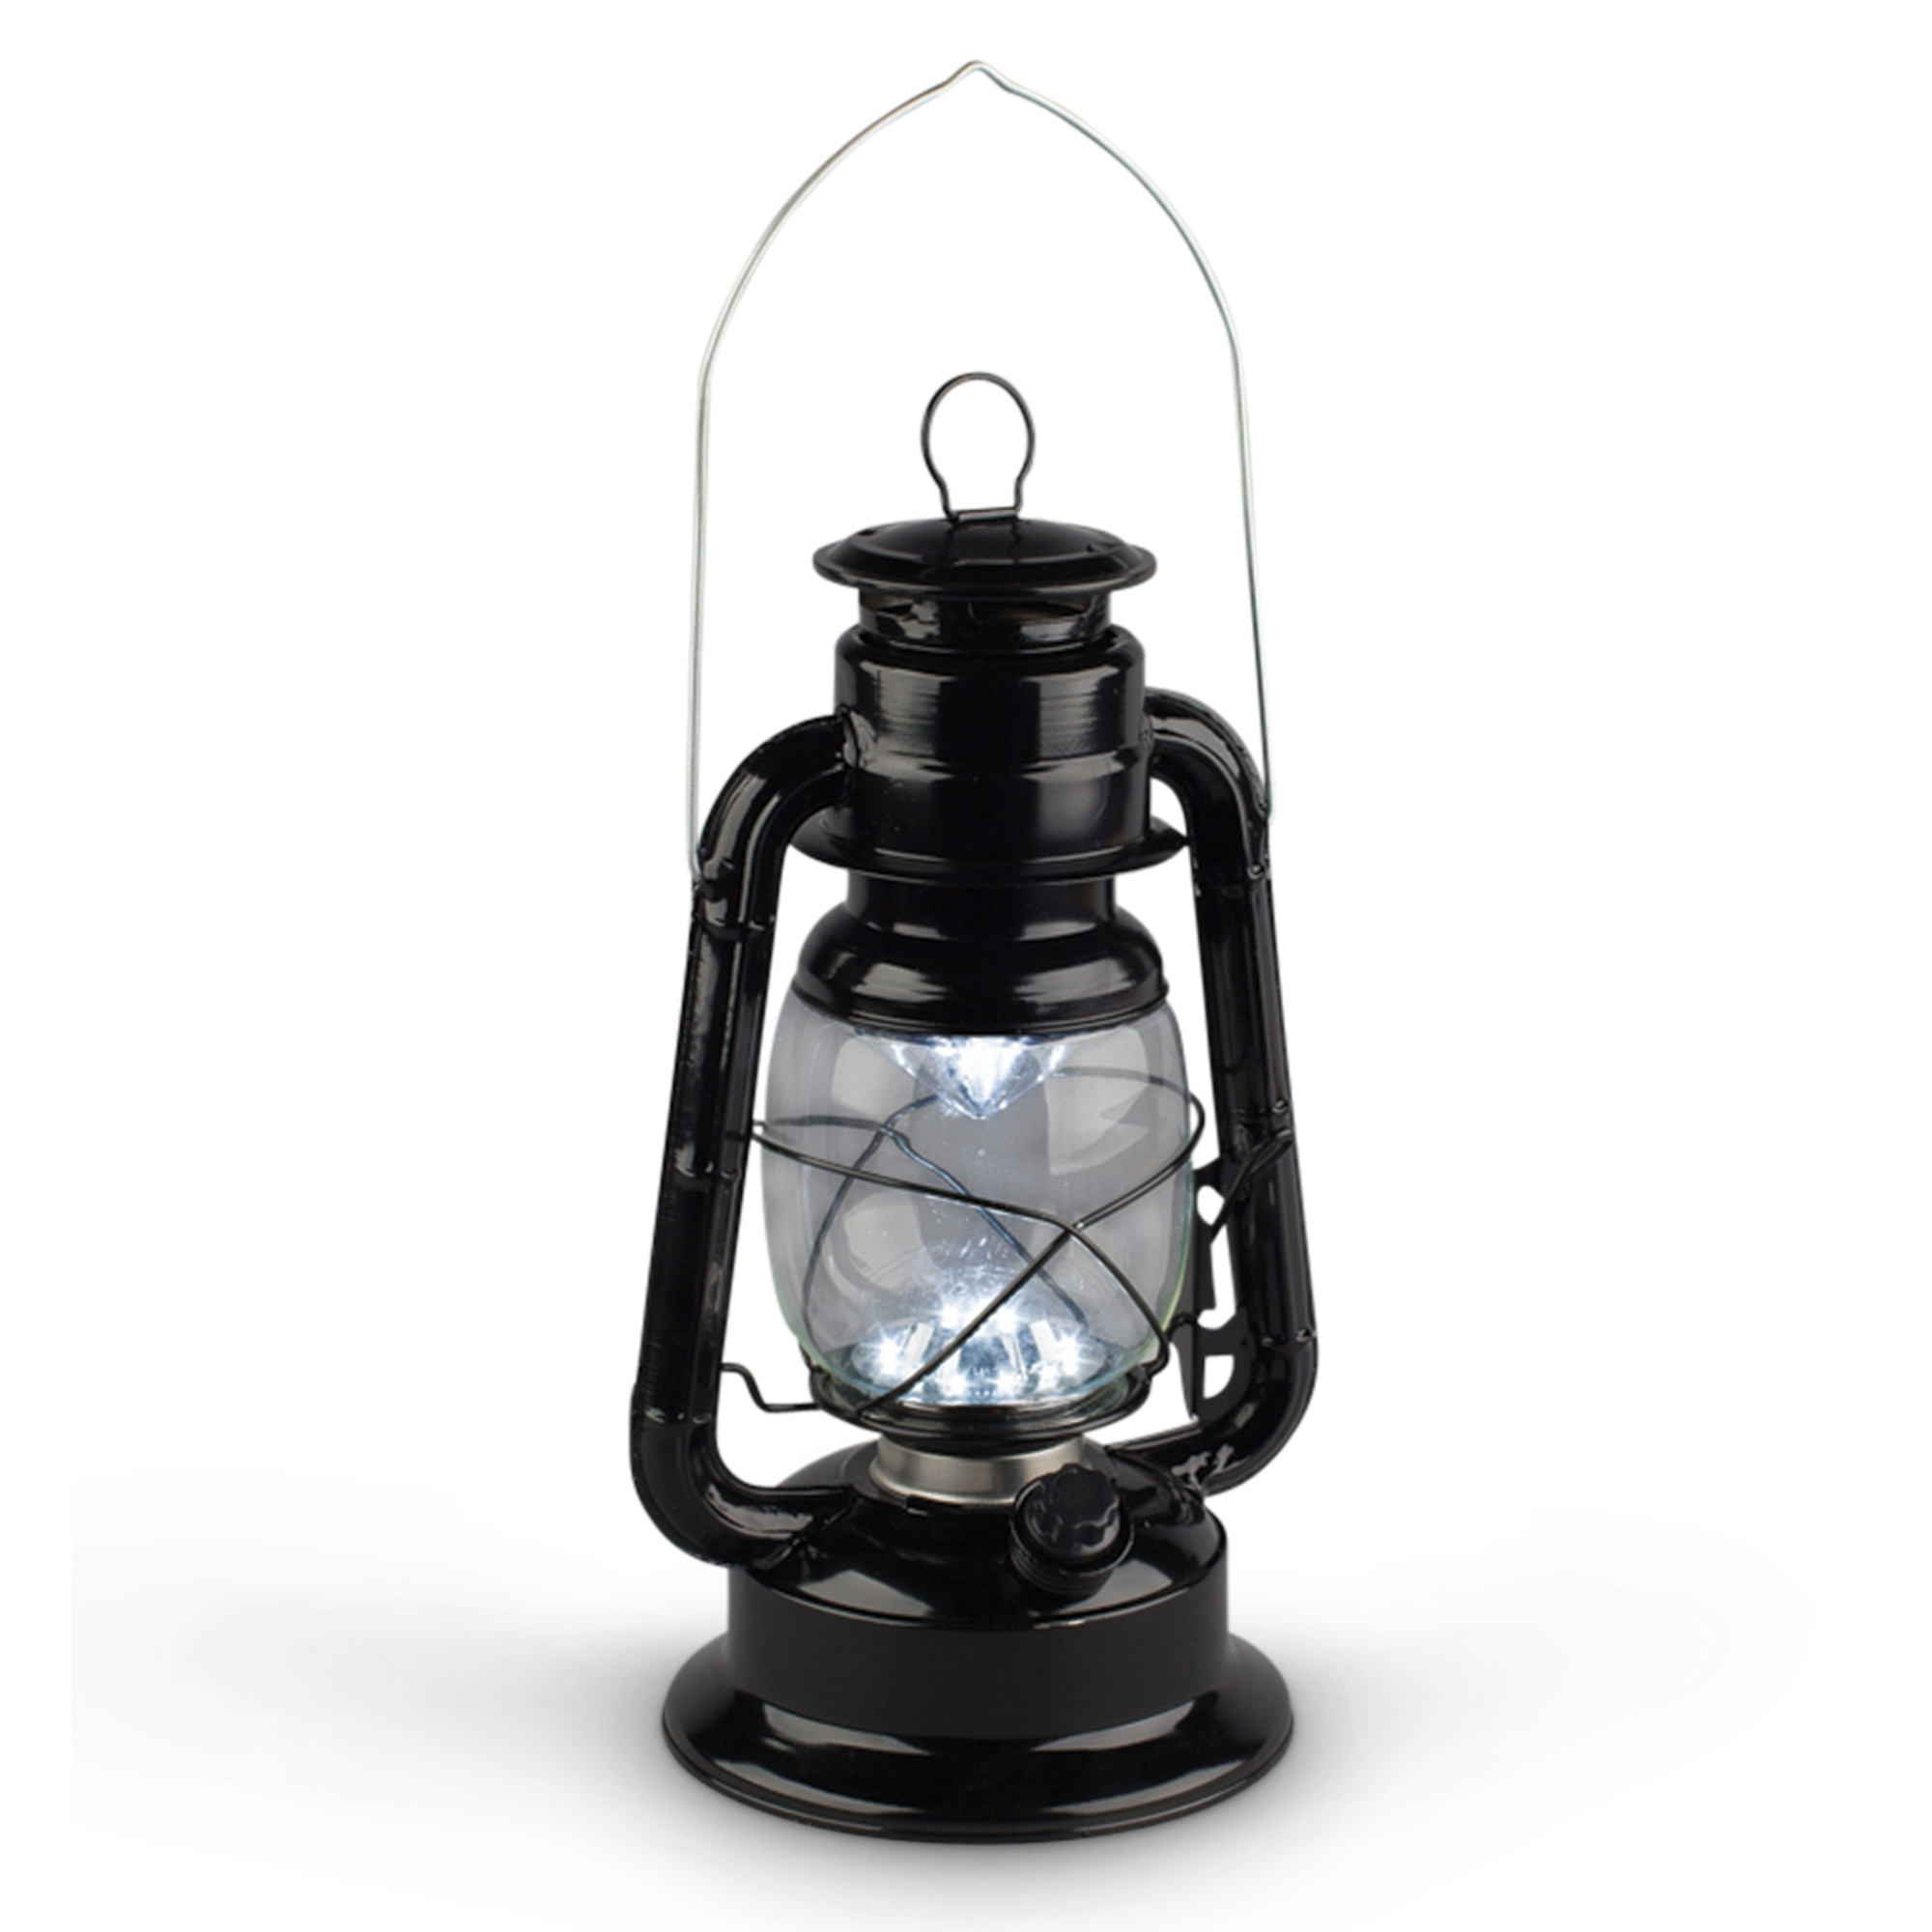 Vintage Metal LED Hurricane Lantern w/Flame Effect - Black